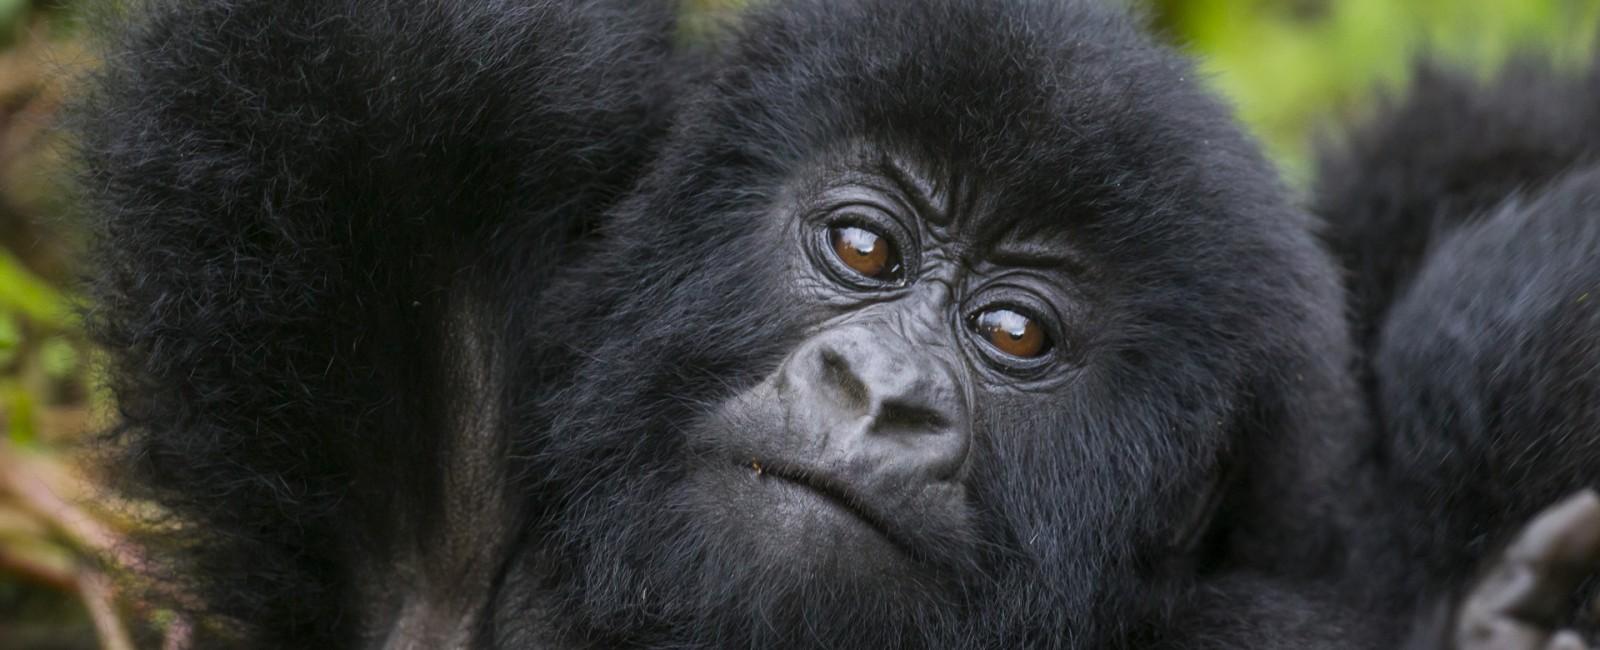 Permalink to The Gorilla Safari: Day 3